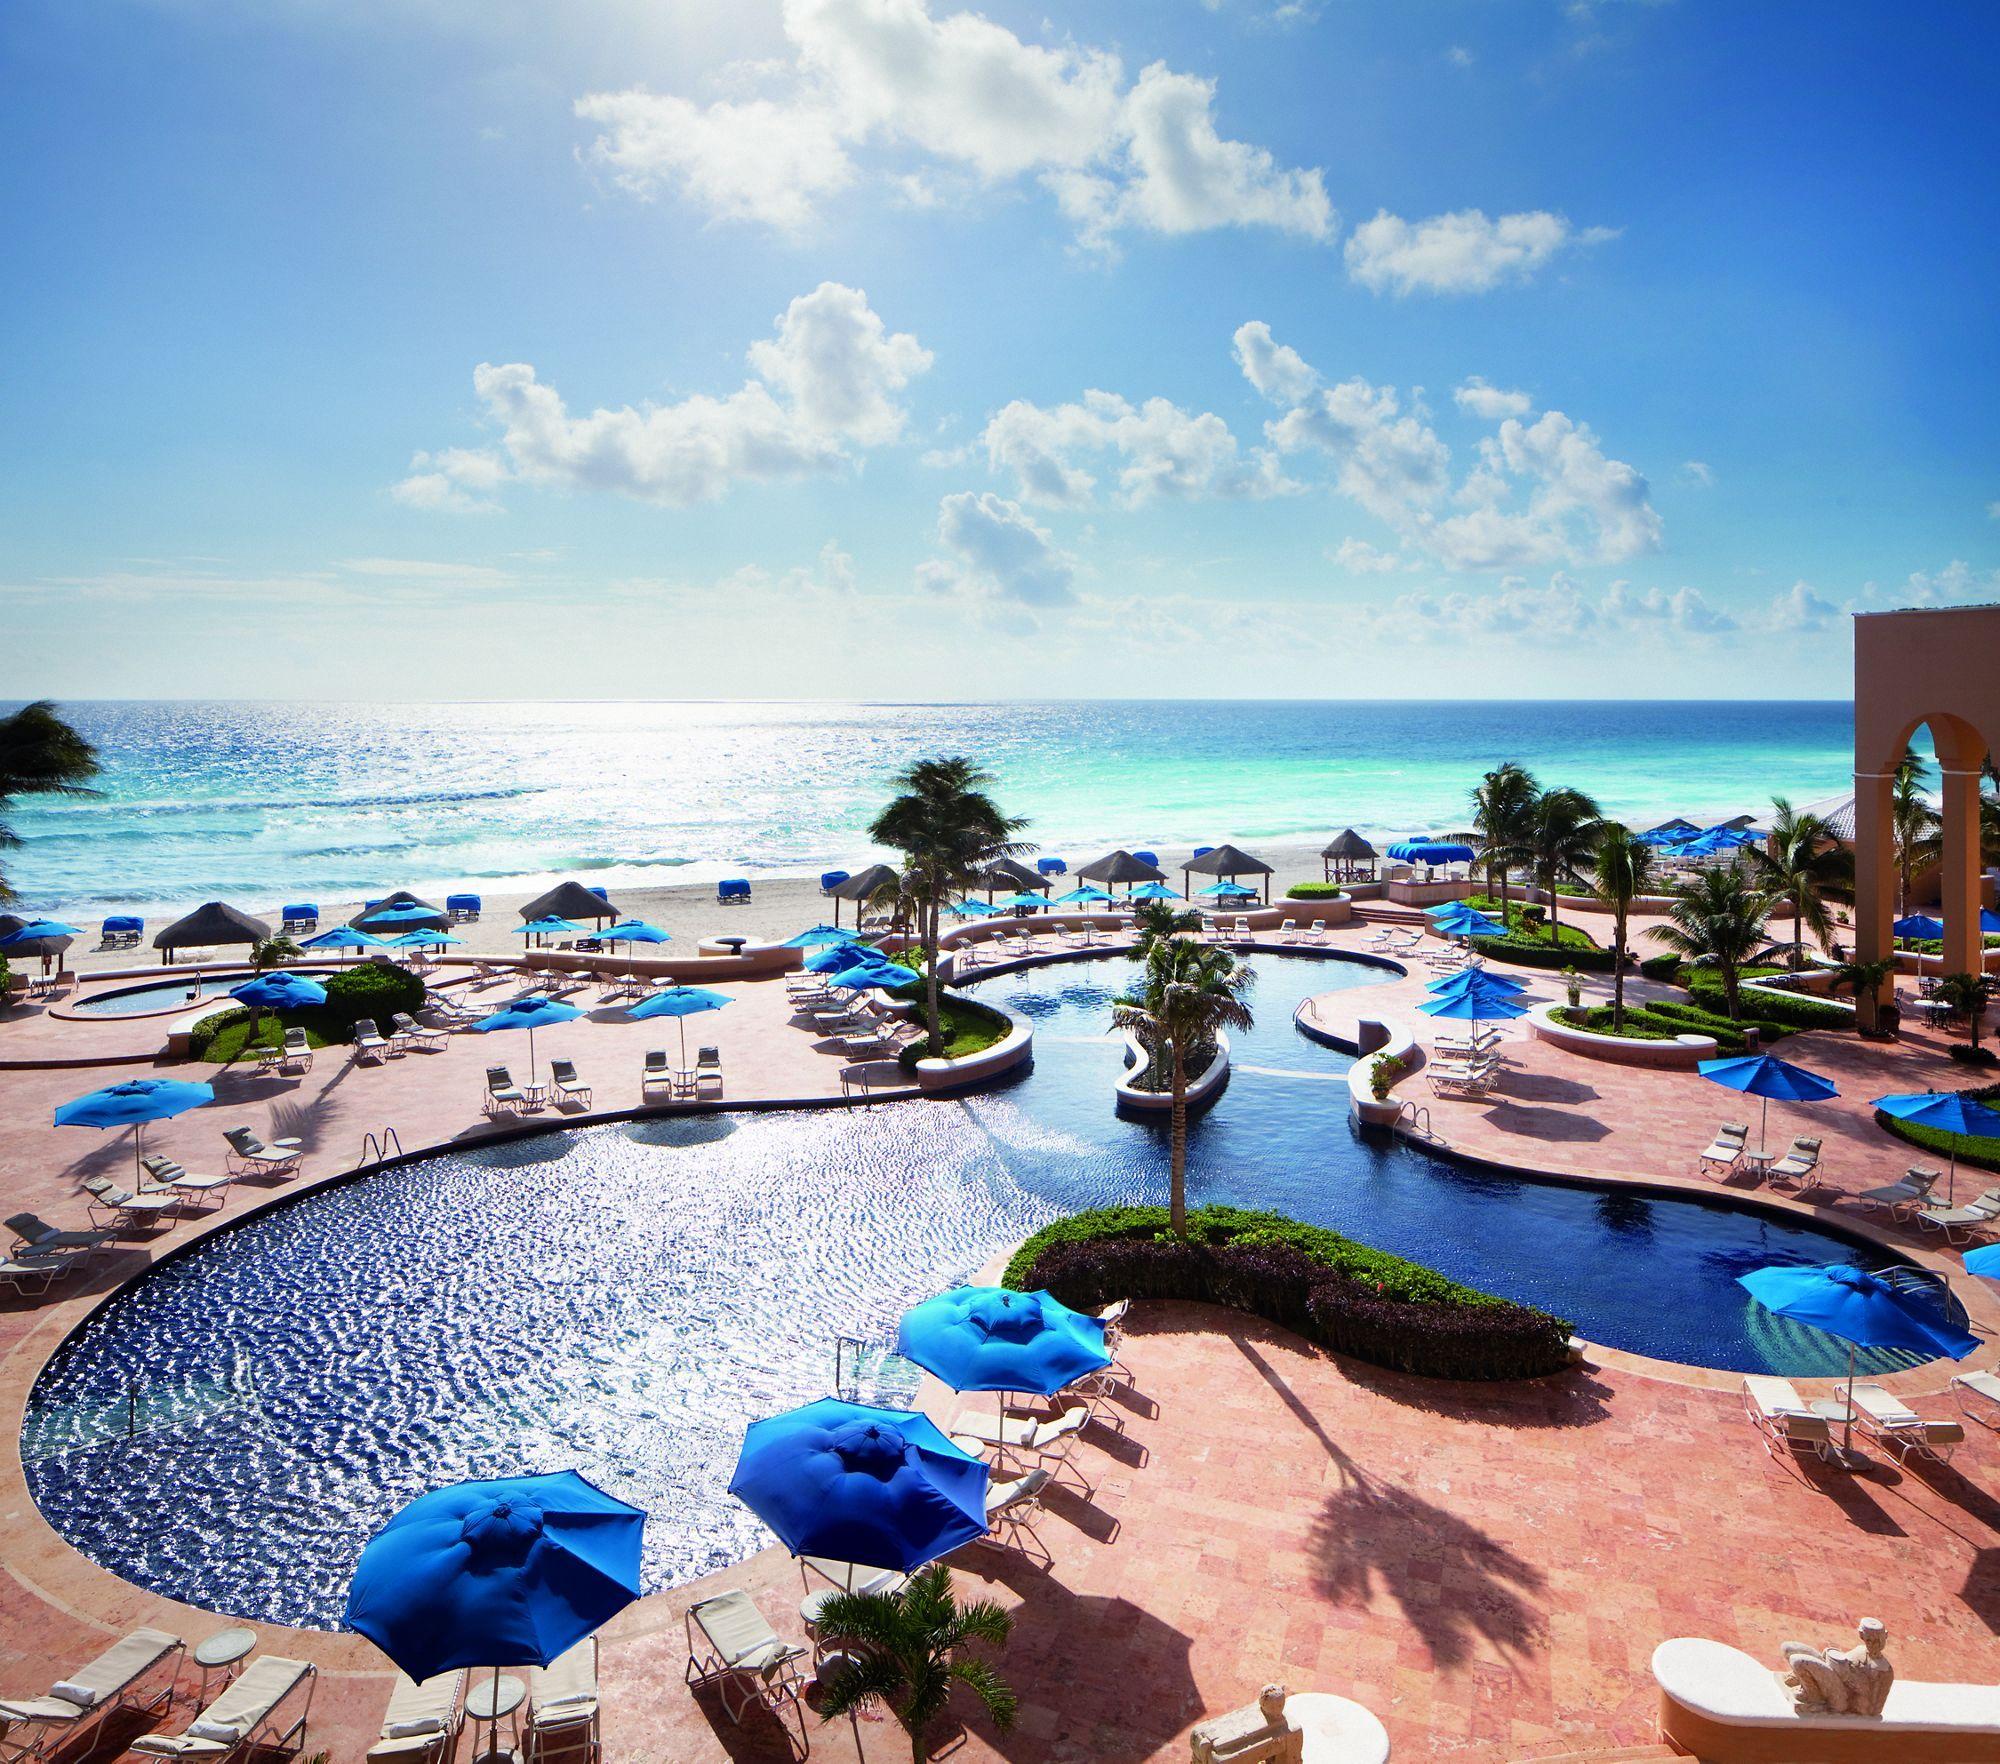 Luxury Hotels Resorts The Ritz Carlton Mexico Hotels Cancun Hotels Caribbean Travel